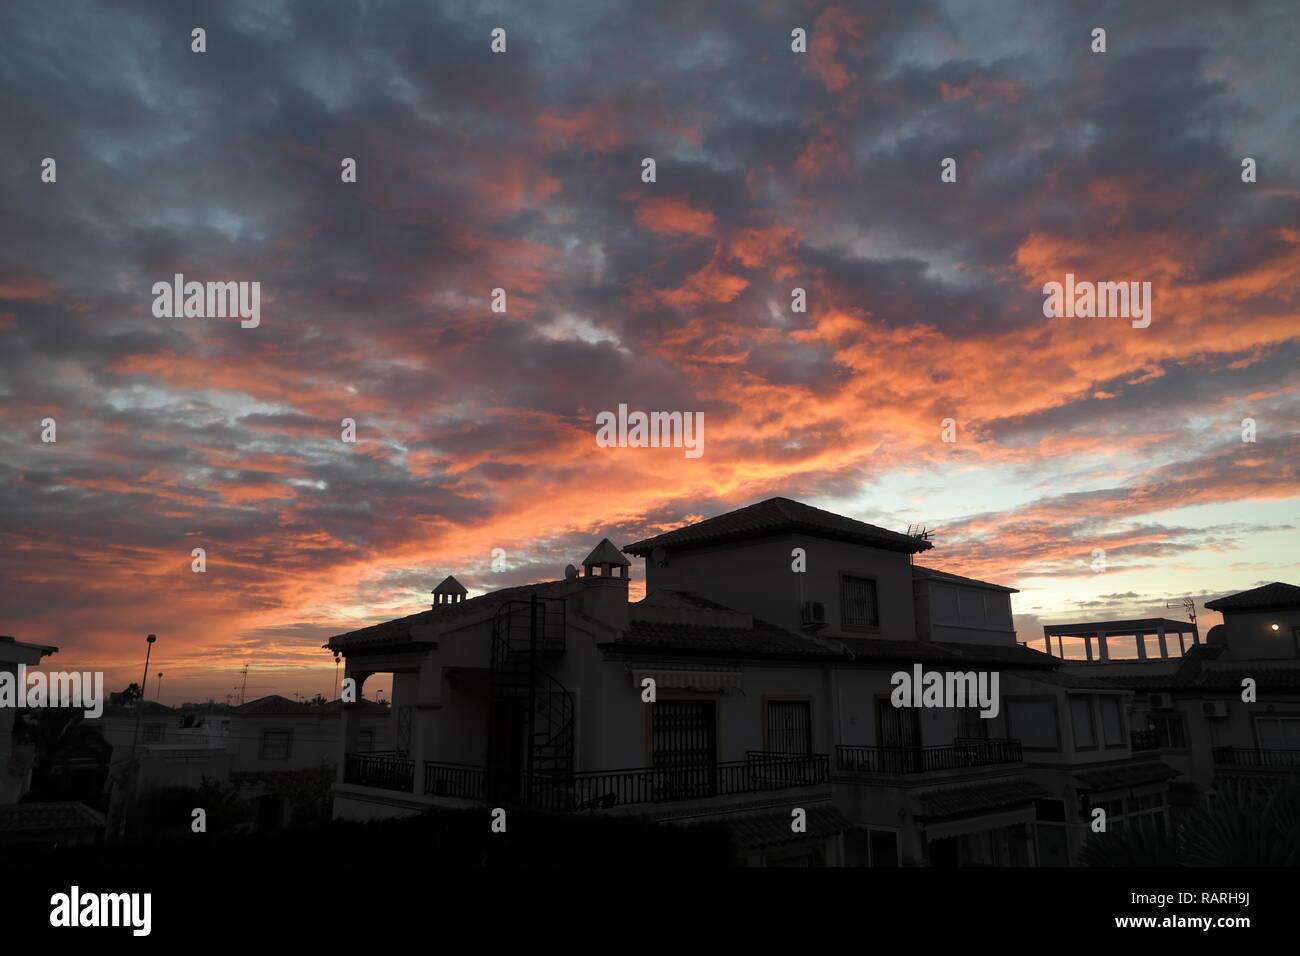 Sunrise over the Med. - Stock Image